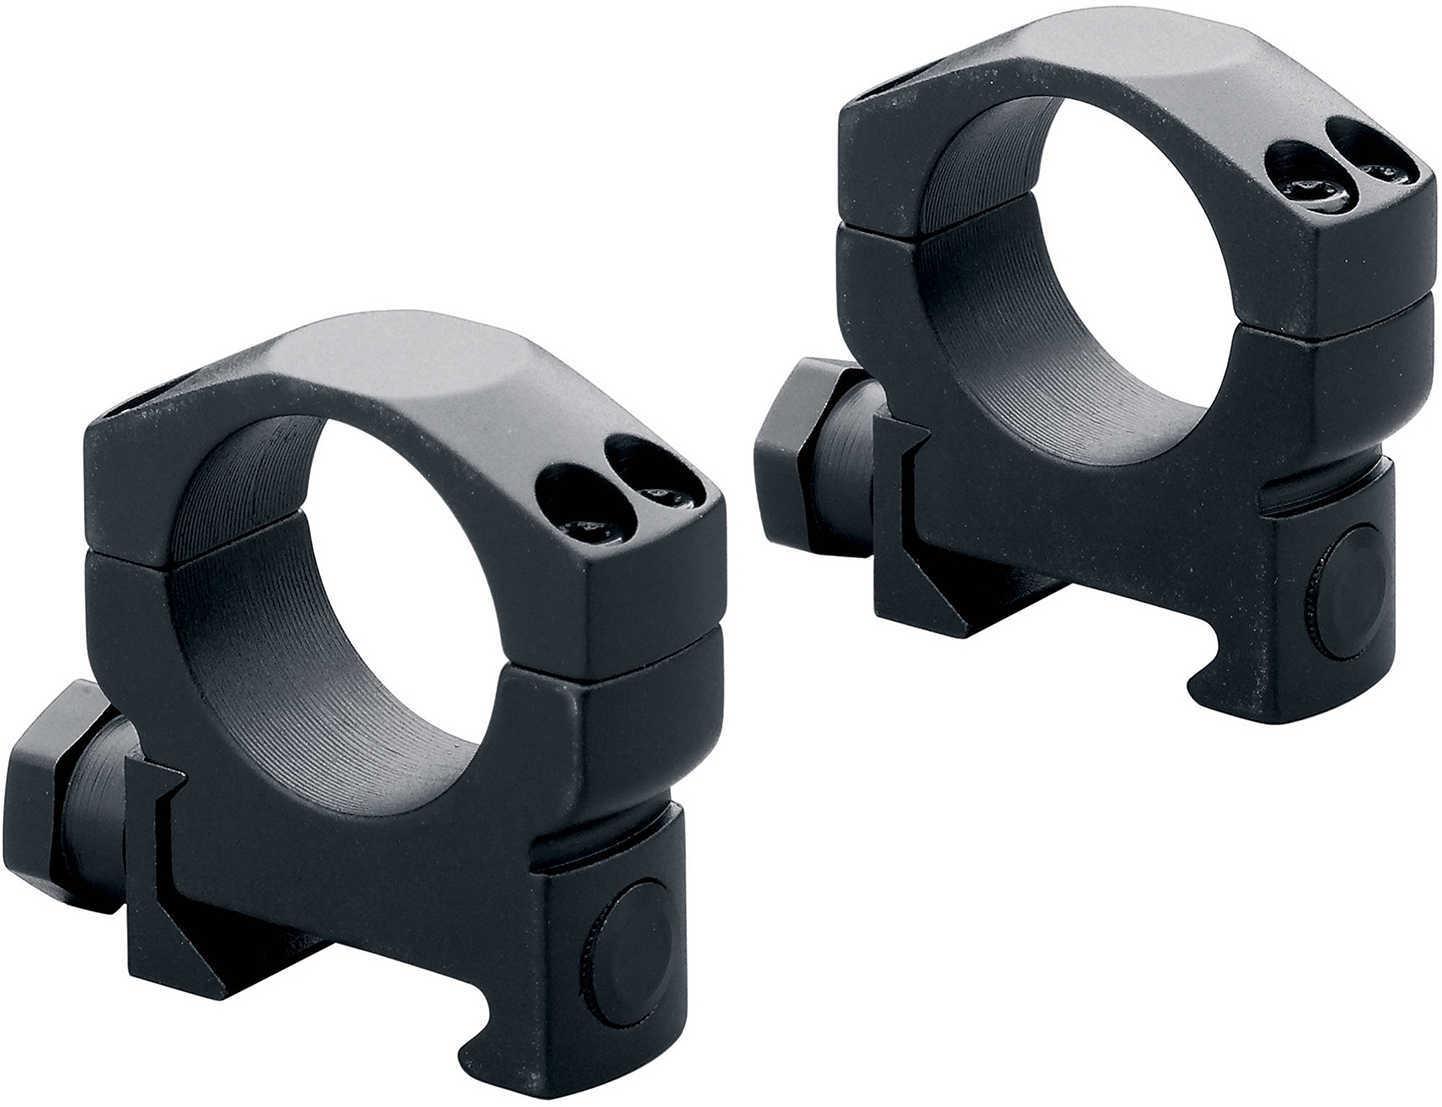 Leupold Mark 4 Picatinny-Style Rings, 35mm Super High, Matte Black